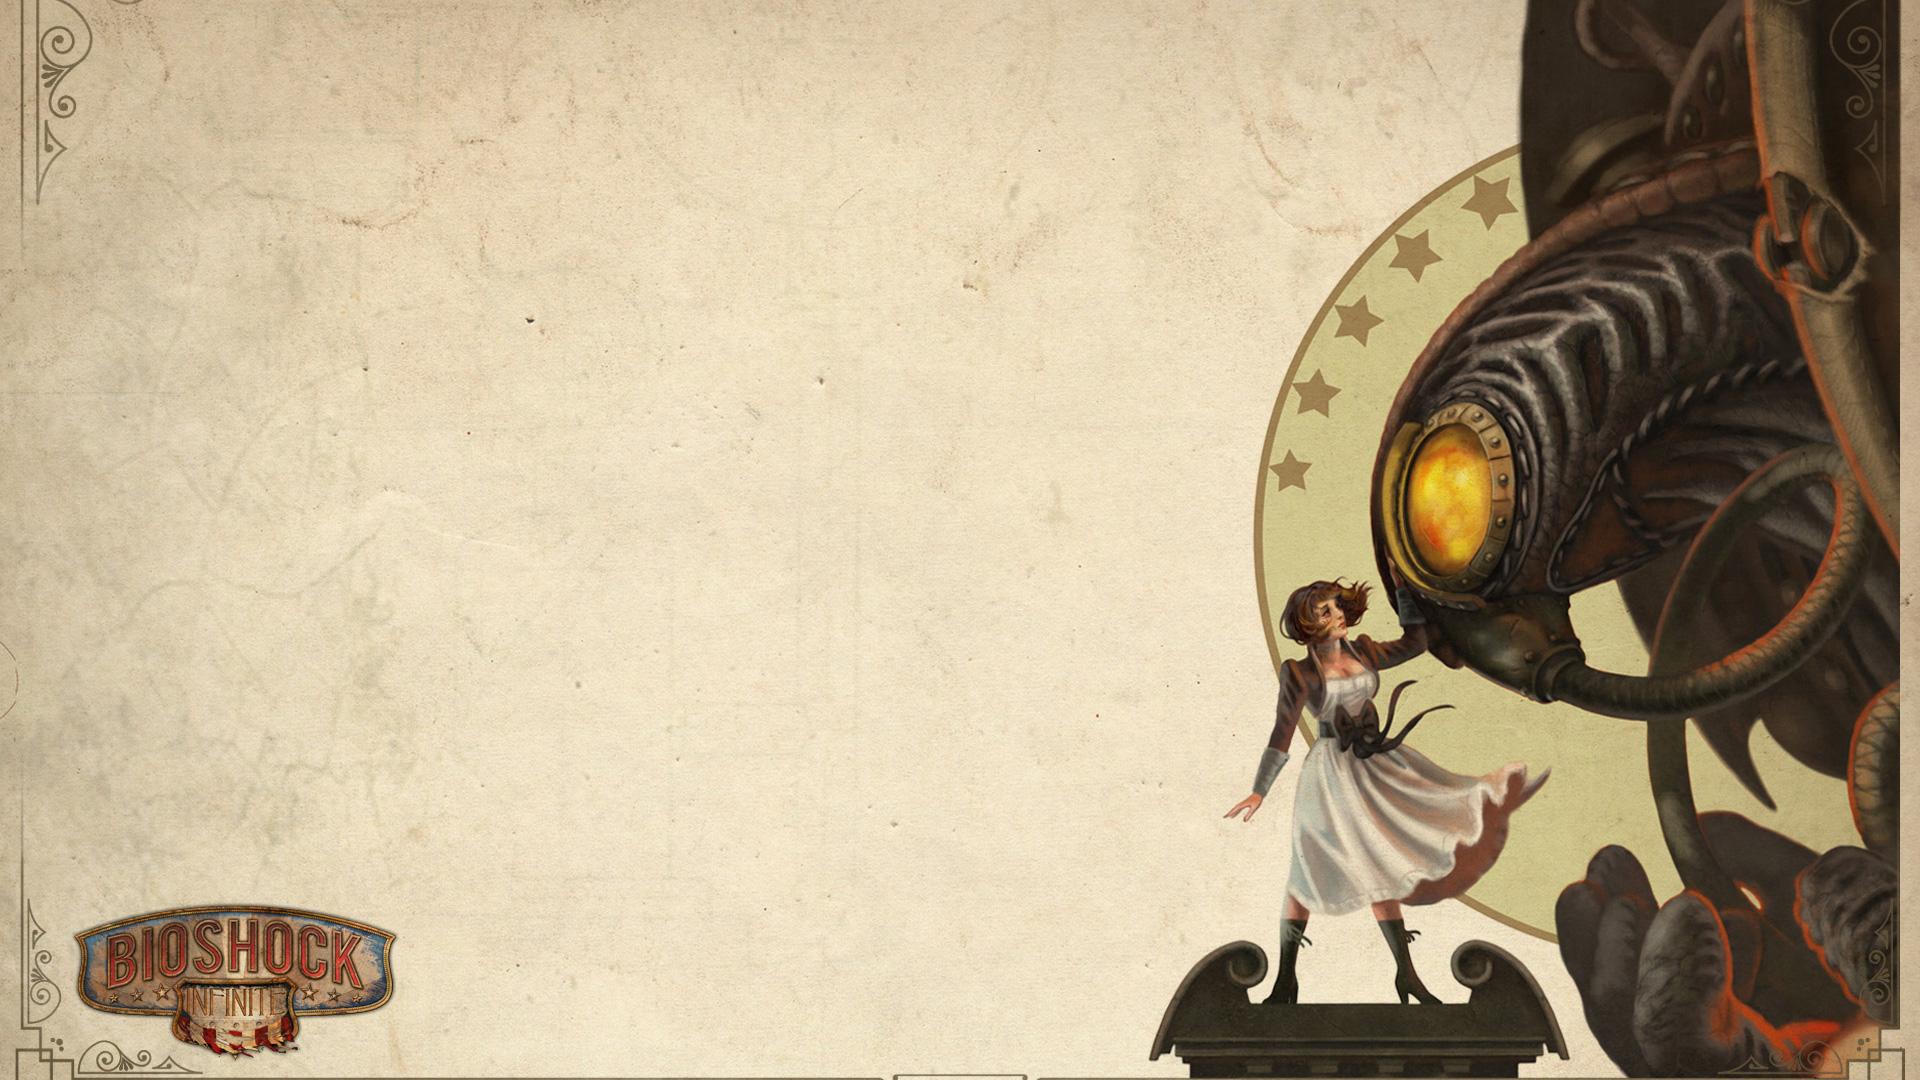 Bioshock Infinite wallpaper 16